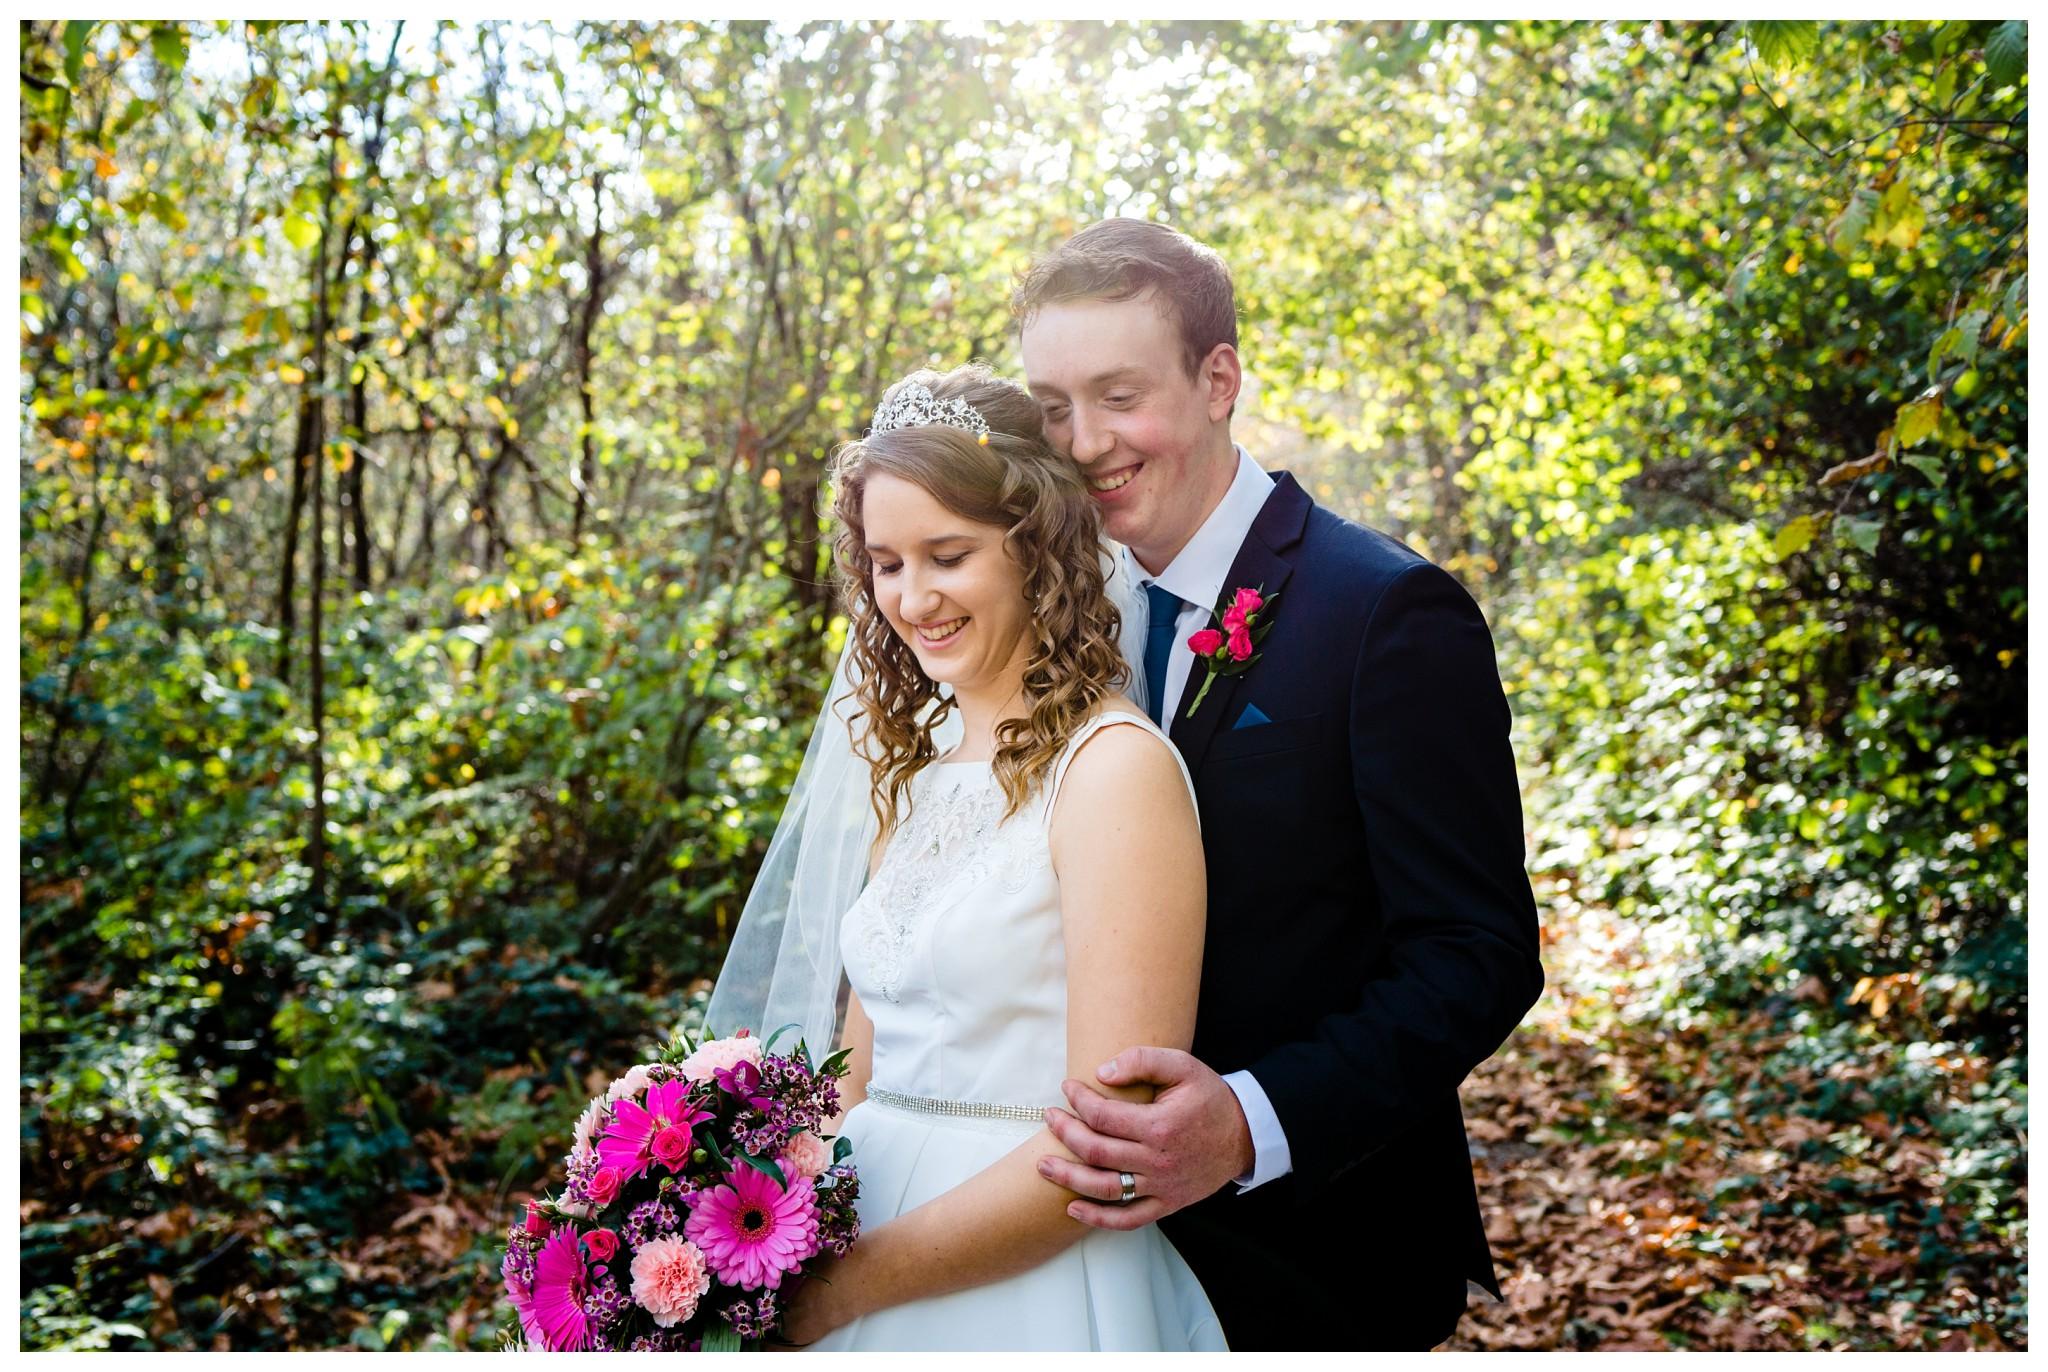 Aldergrove Park Christian Church Wedding Photography Pink Flowers Blue Bridesmaid Dress Fall_0098.jpg